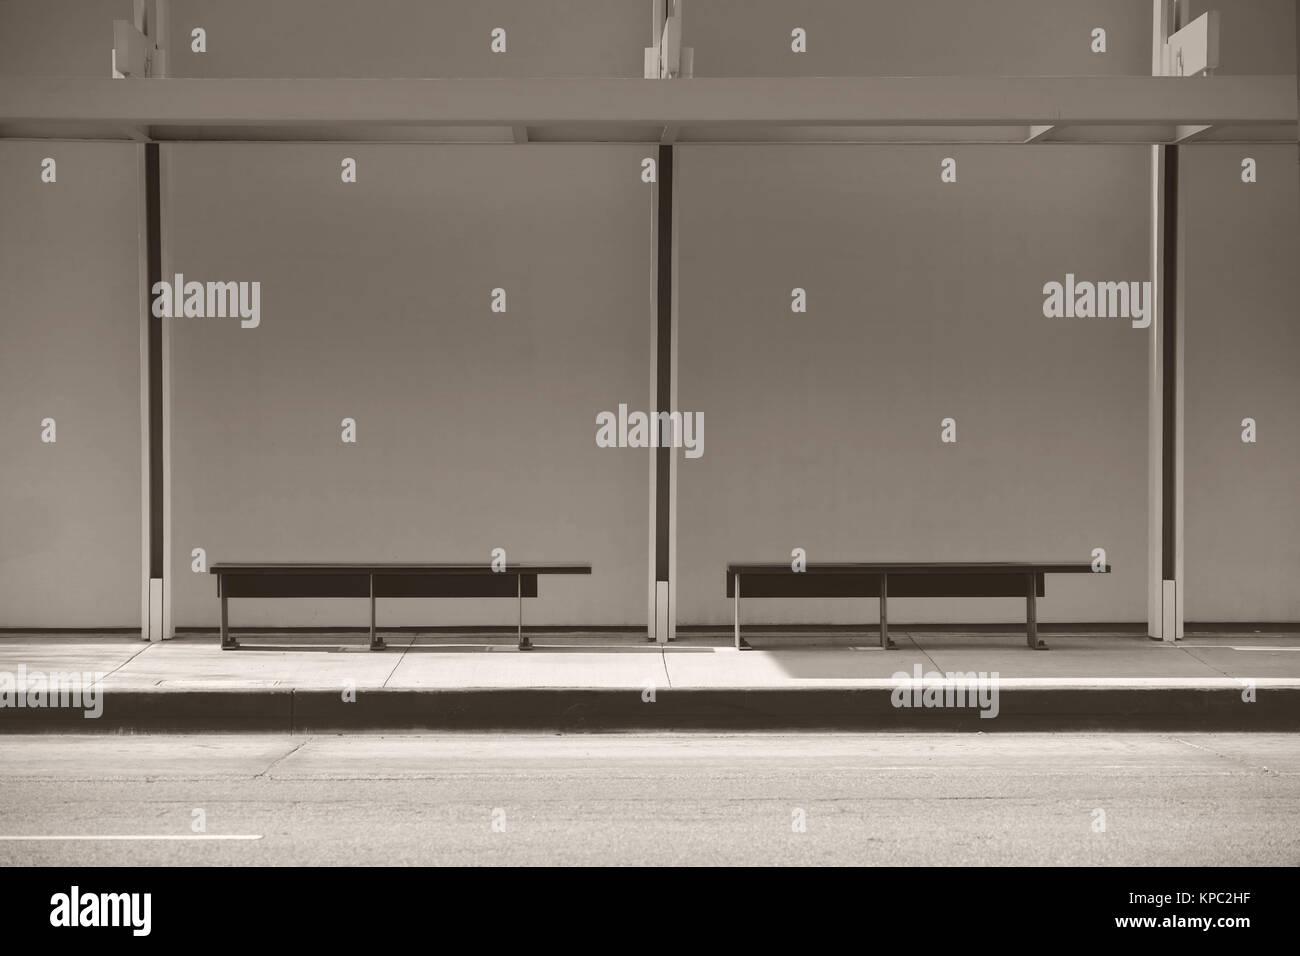 berdachung stock photos berdachung stock images alamy. Black Bedroom Furniture Sets. Home Design Ideas